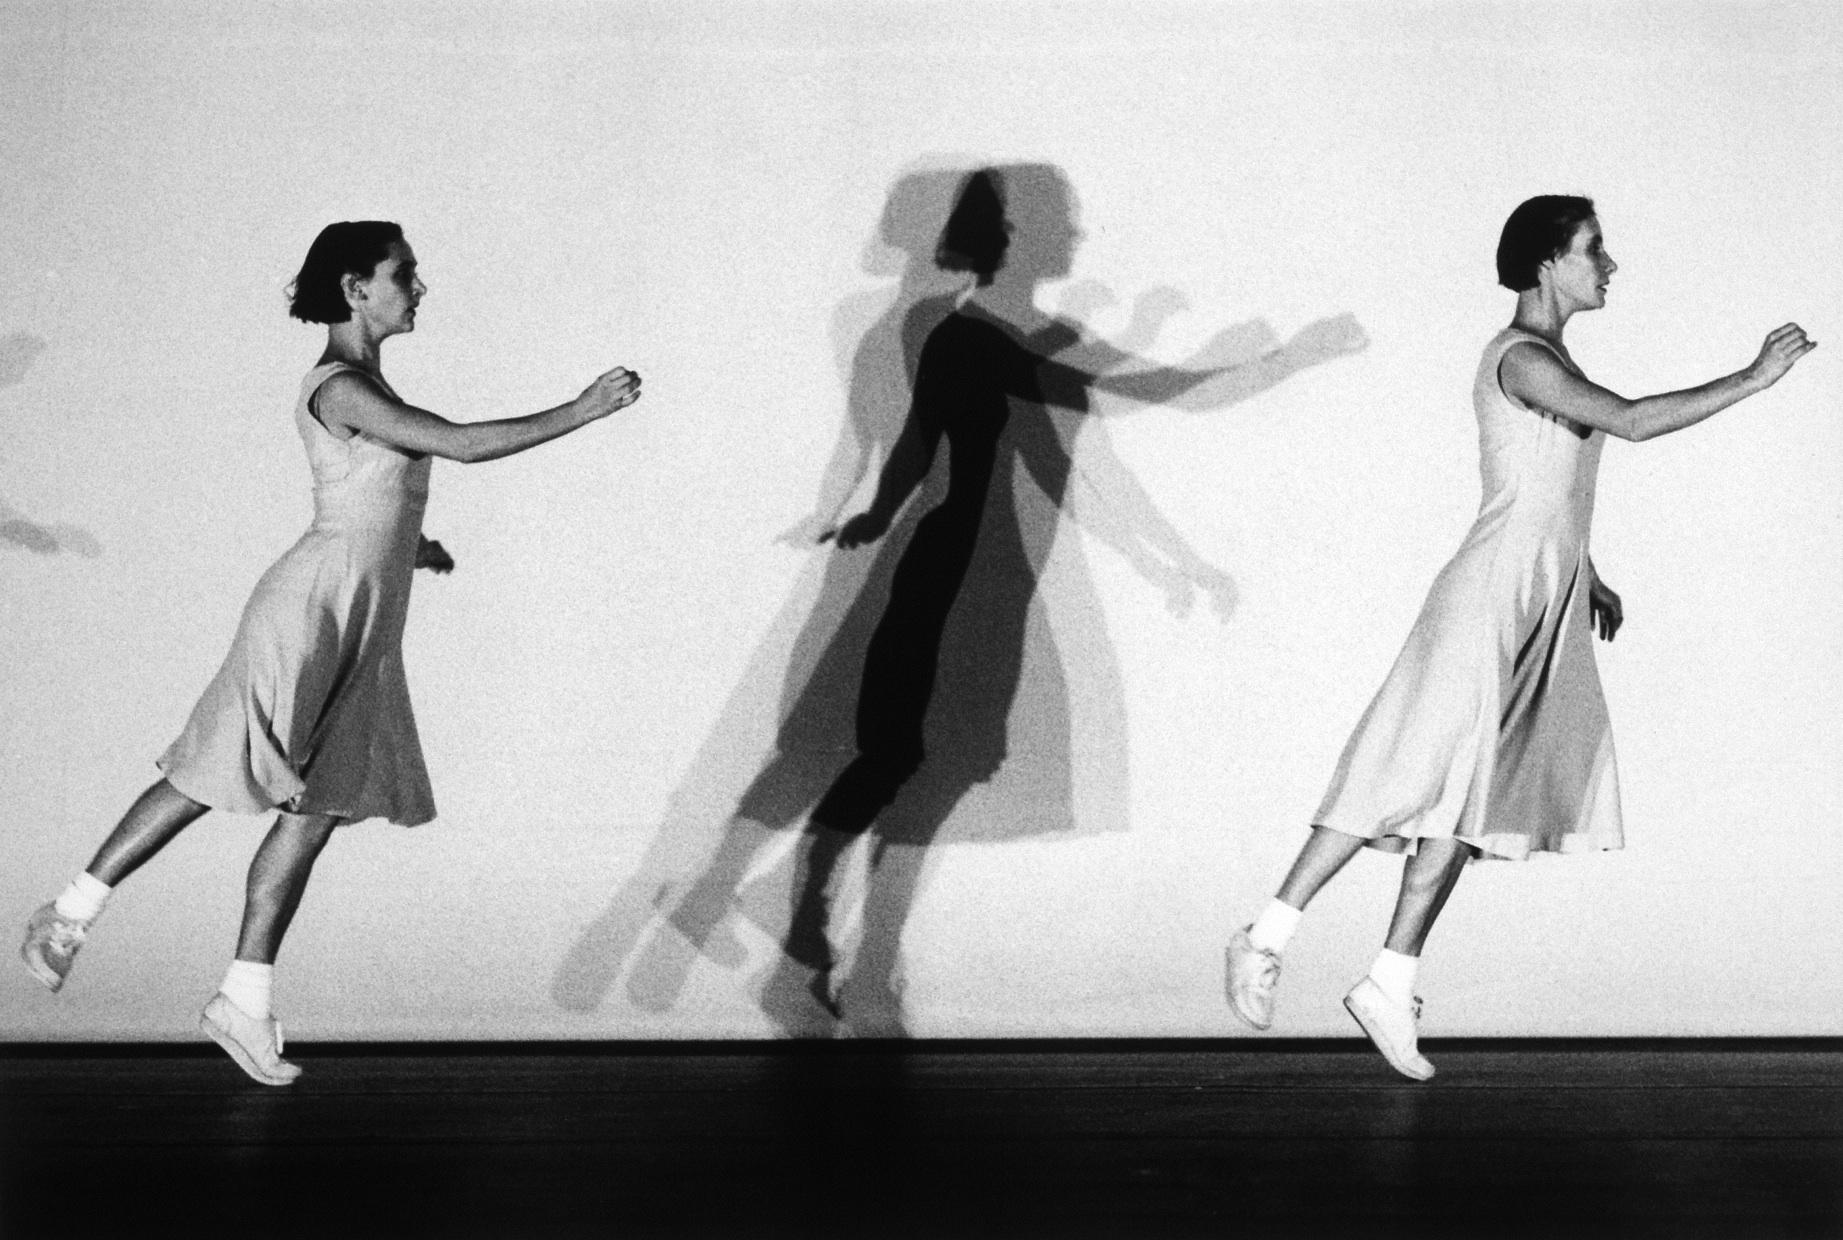 rasas, fase, vortex temporum, anne teresa de keersmaeker,contemporary dance